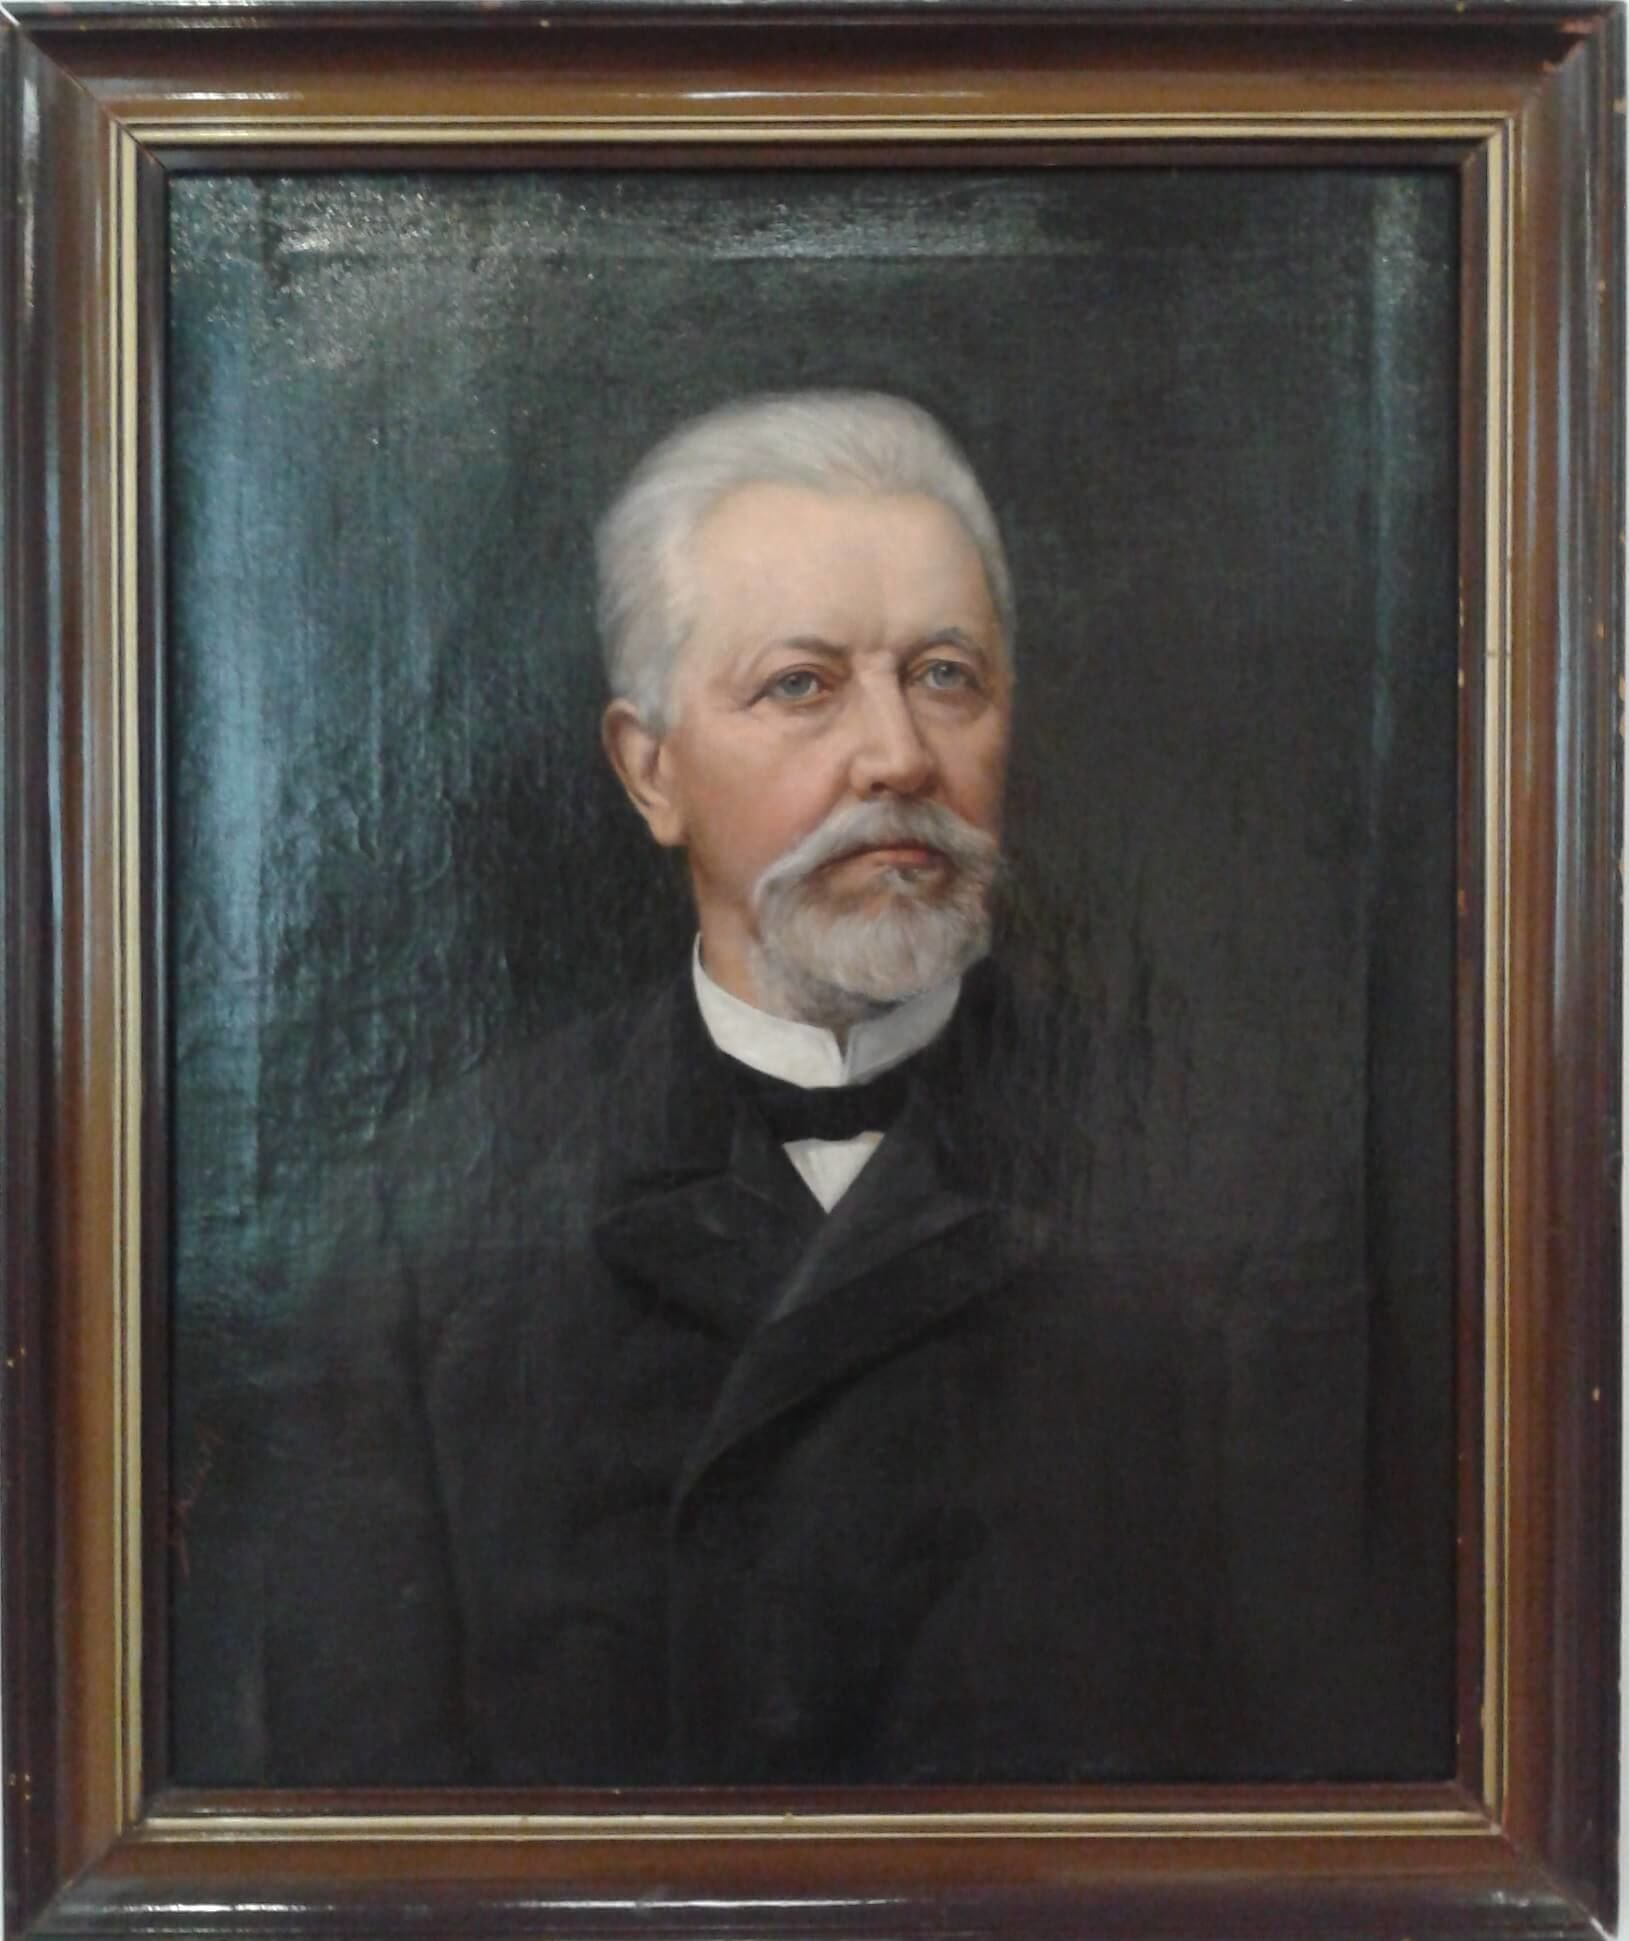 Endrodi Szalacz Gyula